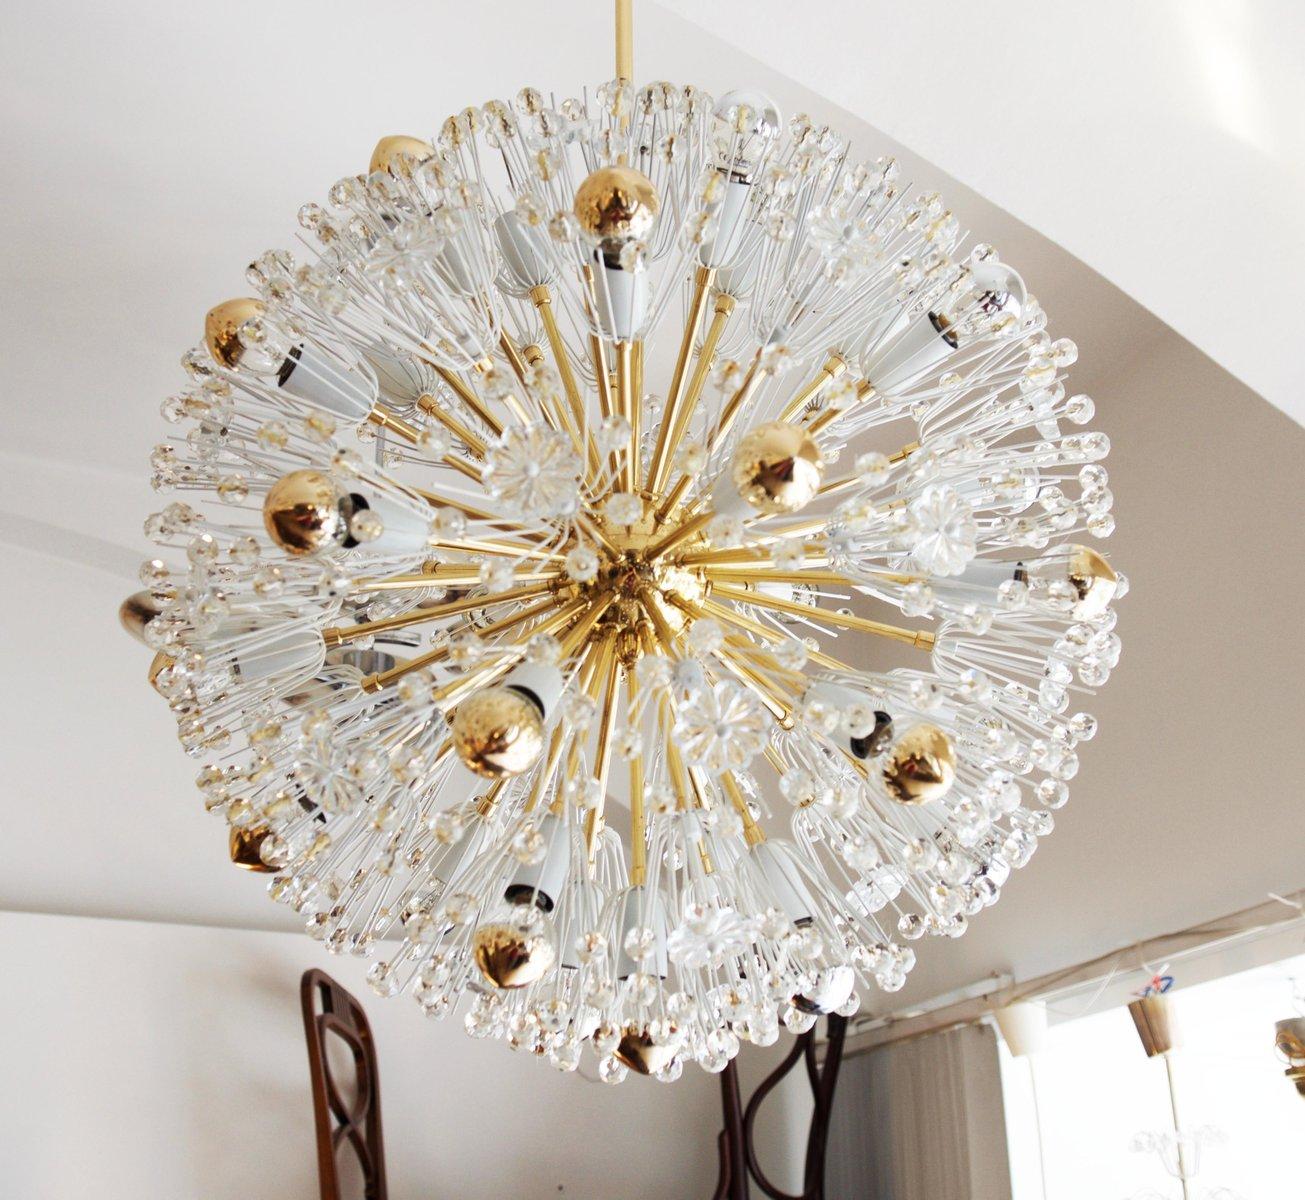 Large austrian brass and glass sputnik chandelier by emil stejnar large austrian brass and glass sputnik chandelier by emil stejnar for rupert nikoll 1955 arubaitofo Image collections